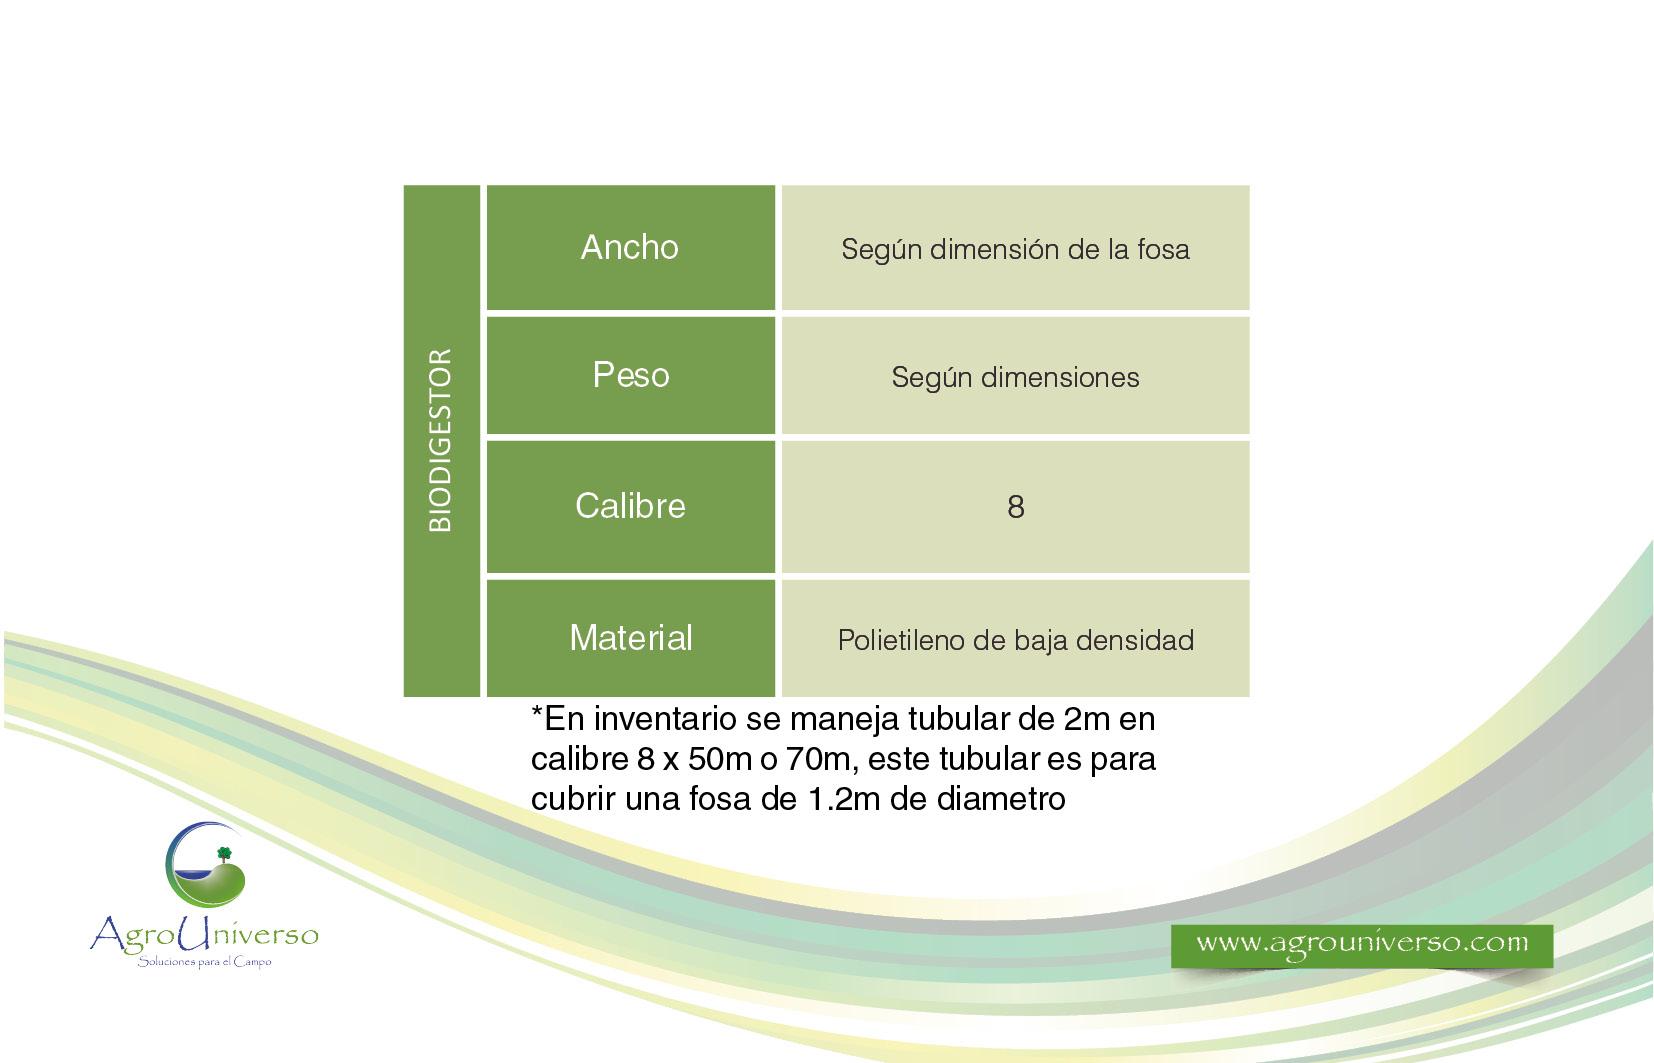 Catlogo-de-productos-Agrouniverso-11